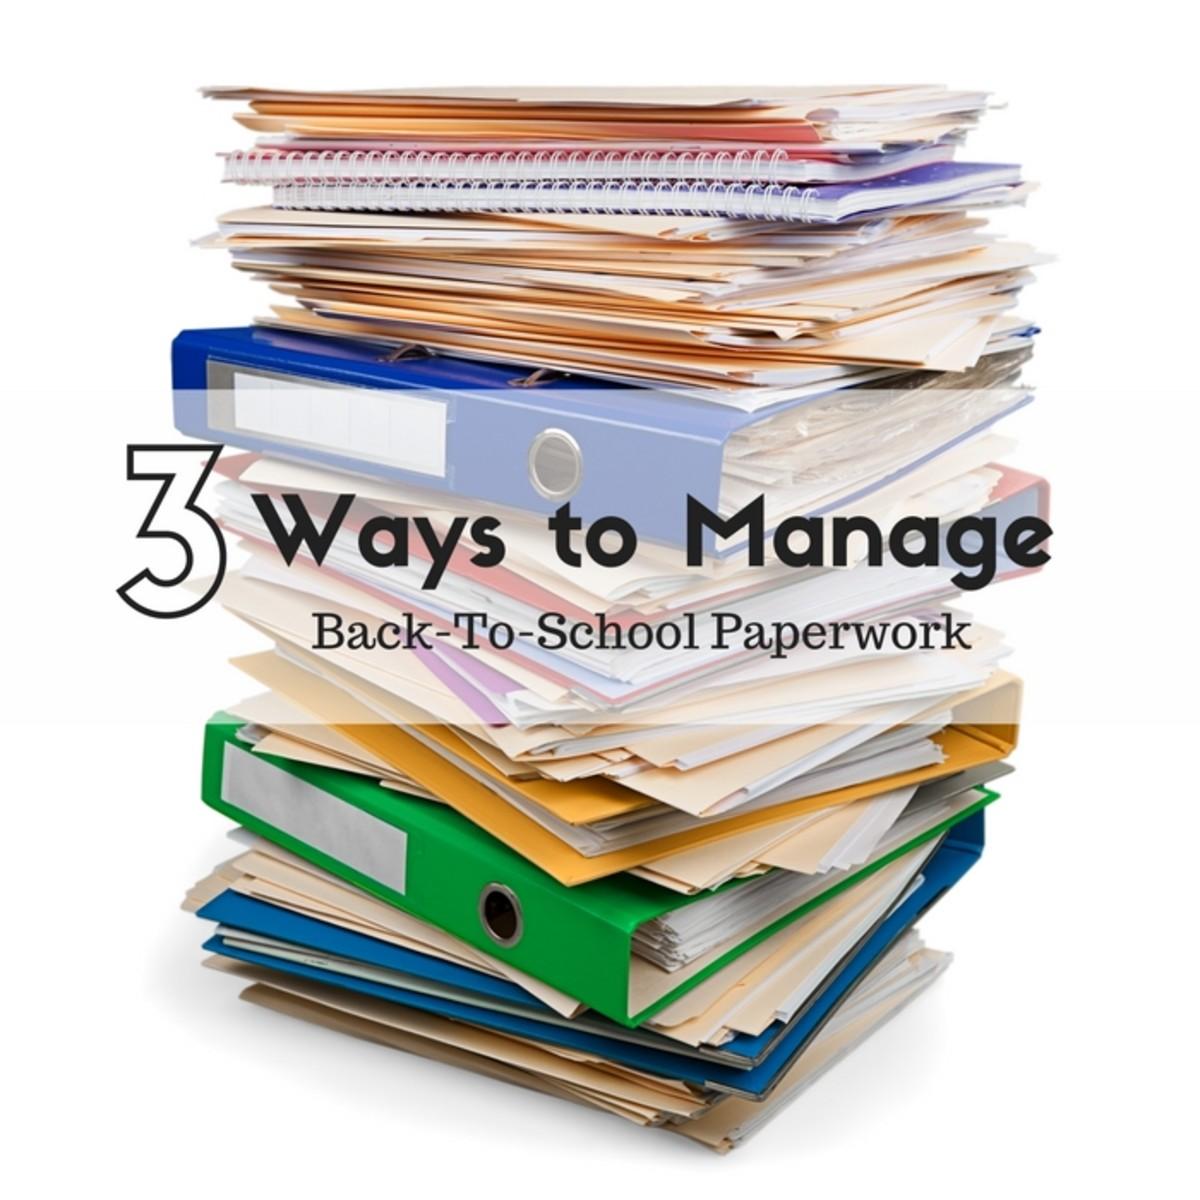 3 Ways to Manage the BTS Paperwork